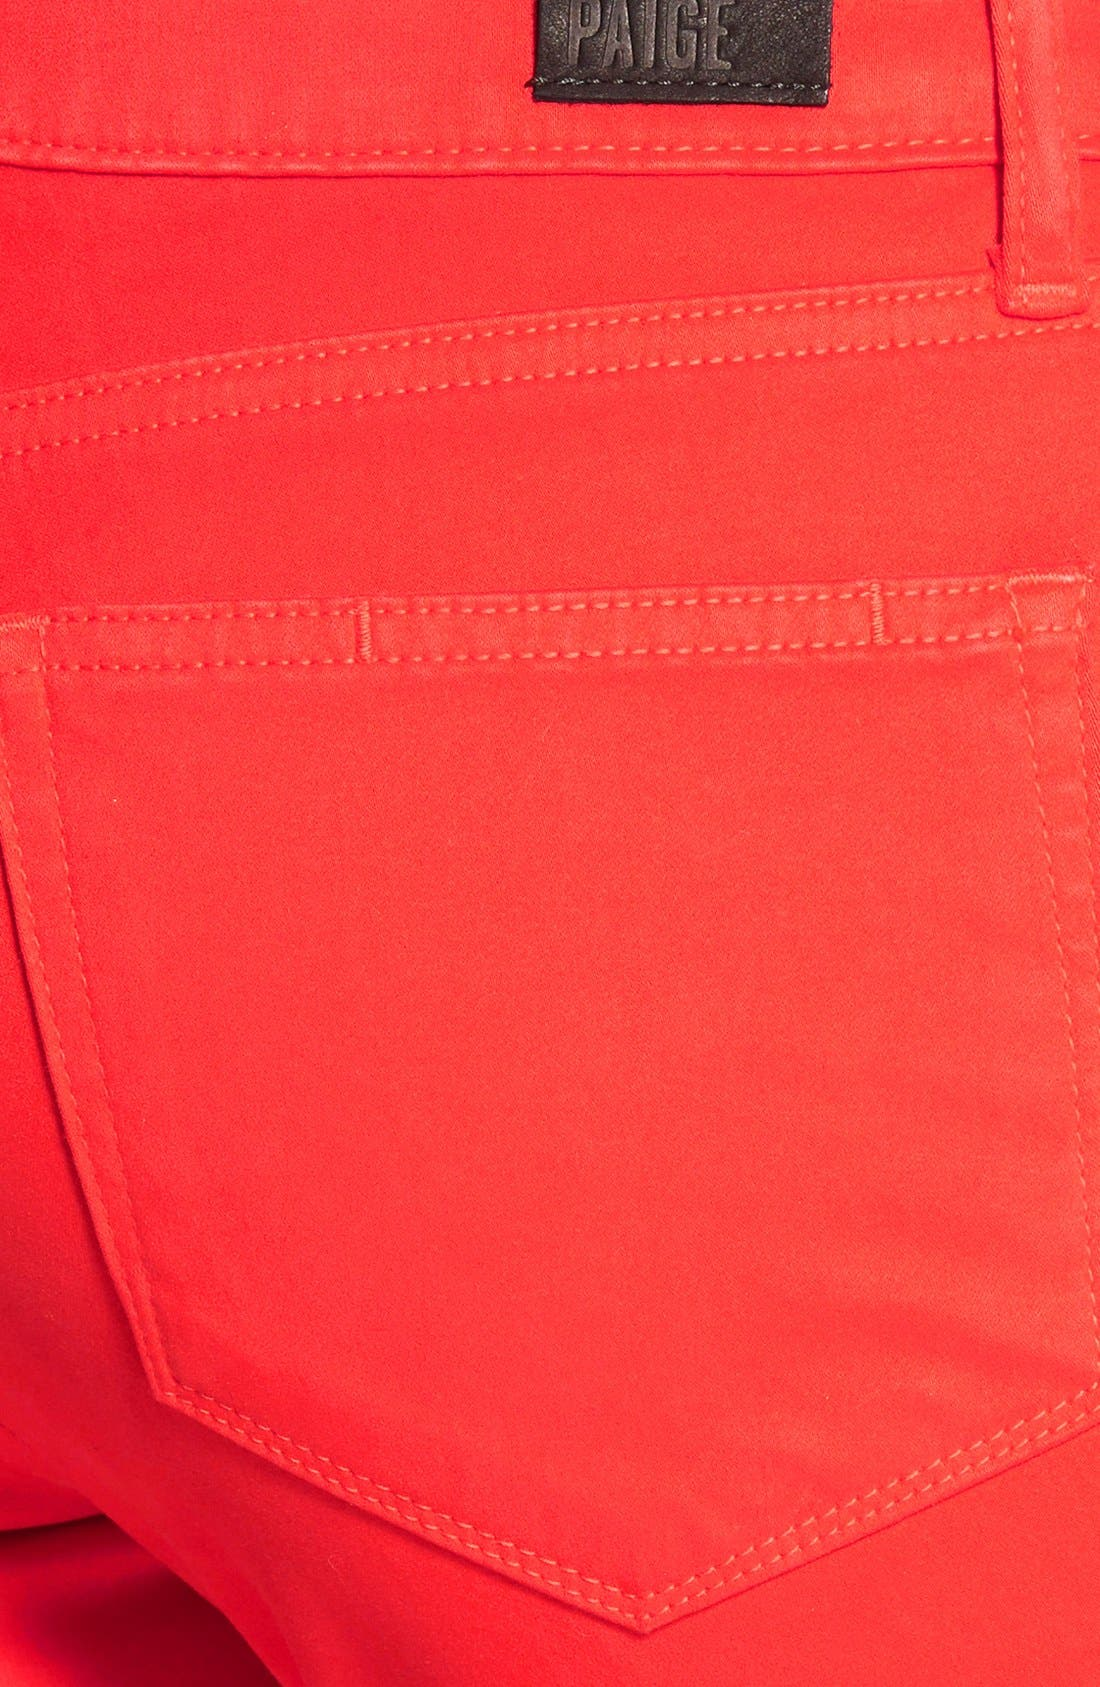 Denim 'Verdugo' Ultra Skinny Jeans,                             Alternate thumbnail 2, color,                             600